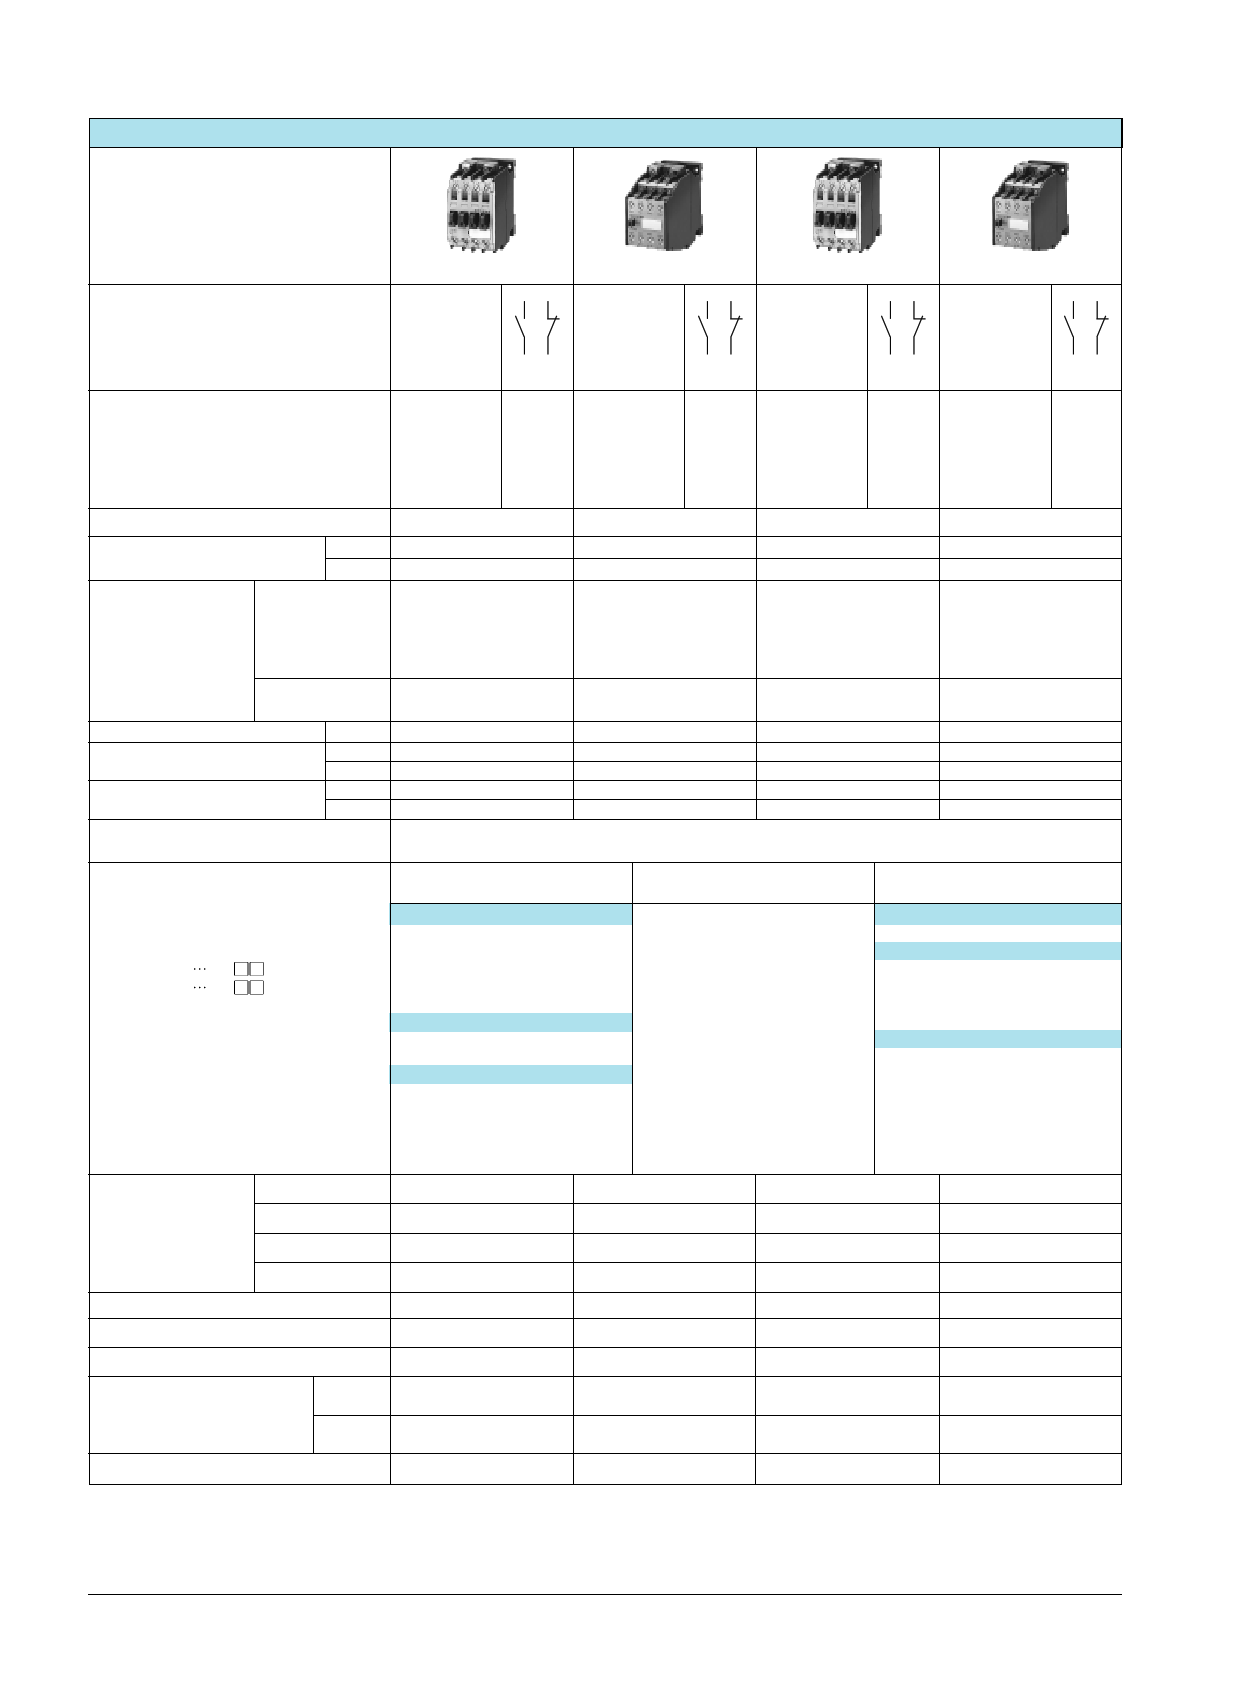 3TF49 Datasheet, 3TF49 PDF,ピン配置, 機能